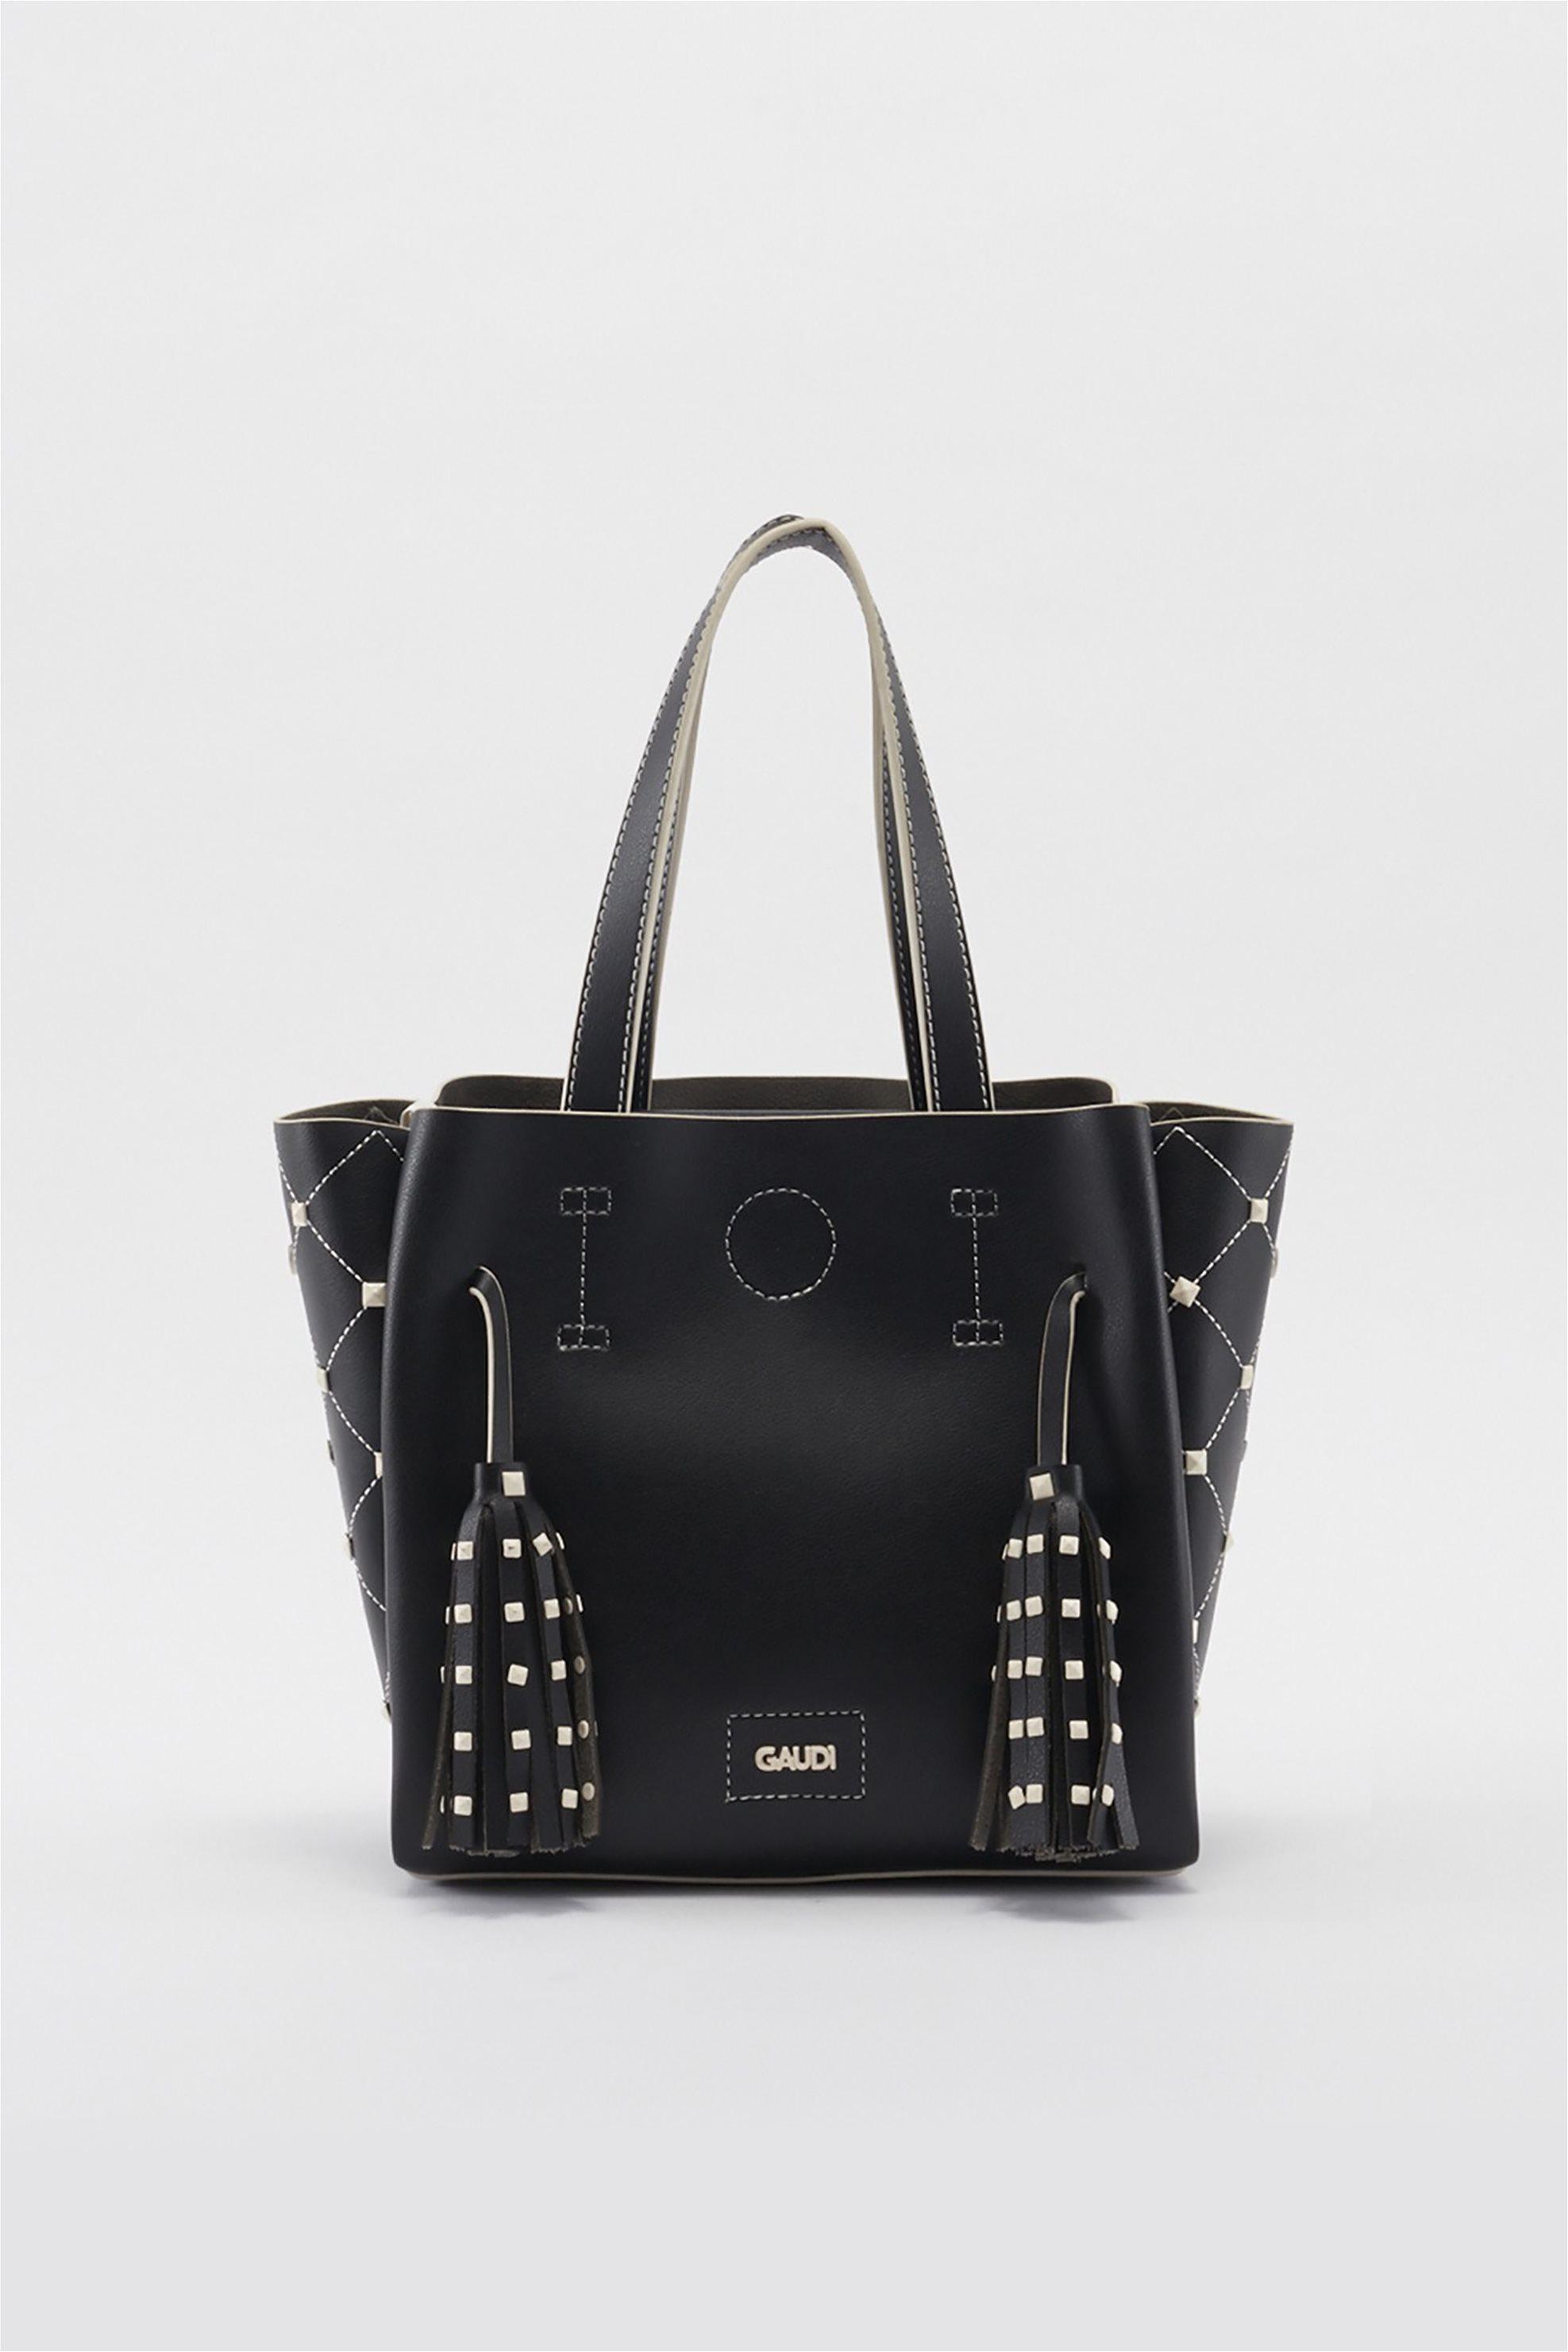 5999406a35 Notos Gaudi γυναικεία τσάντα χειρός Linea Era Valentine - V9A-71151 - Μαύρο